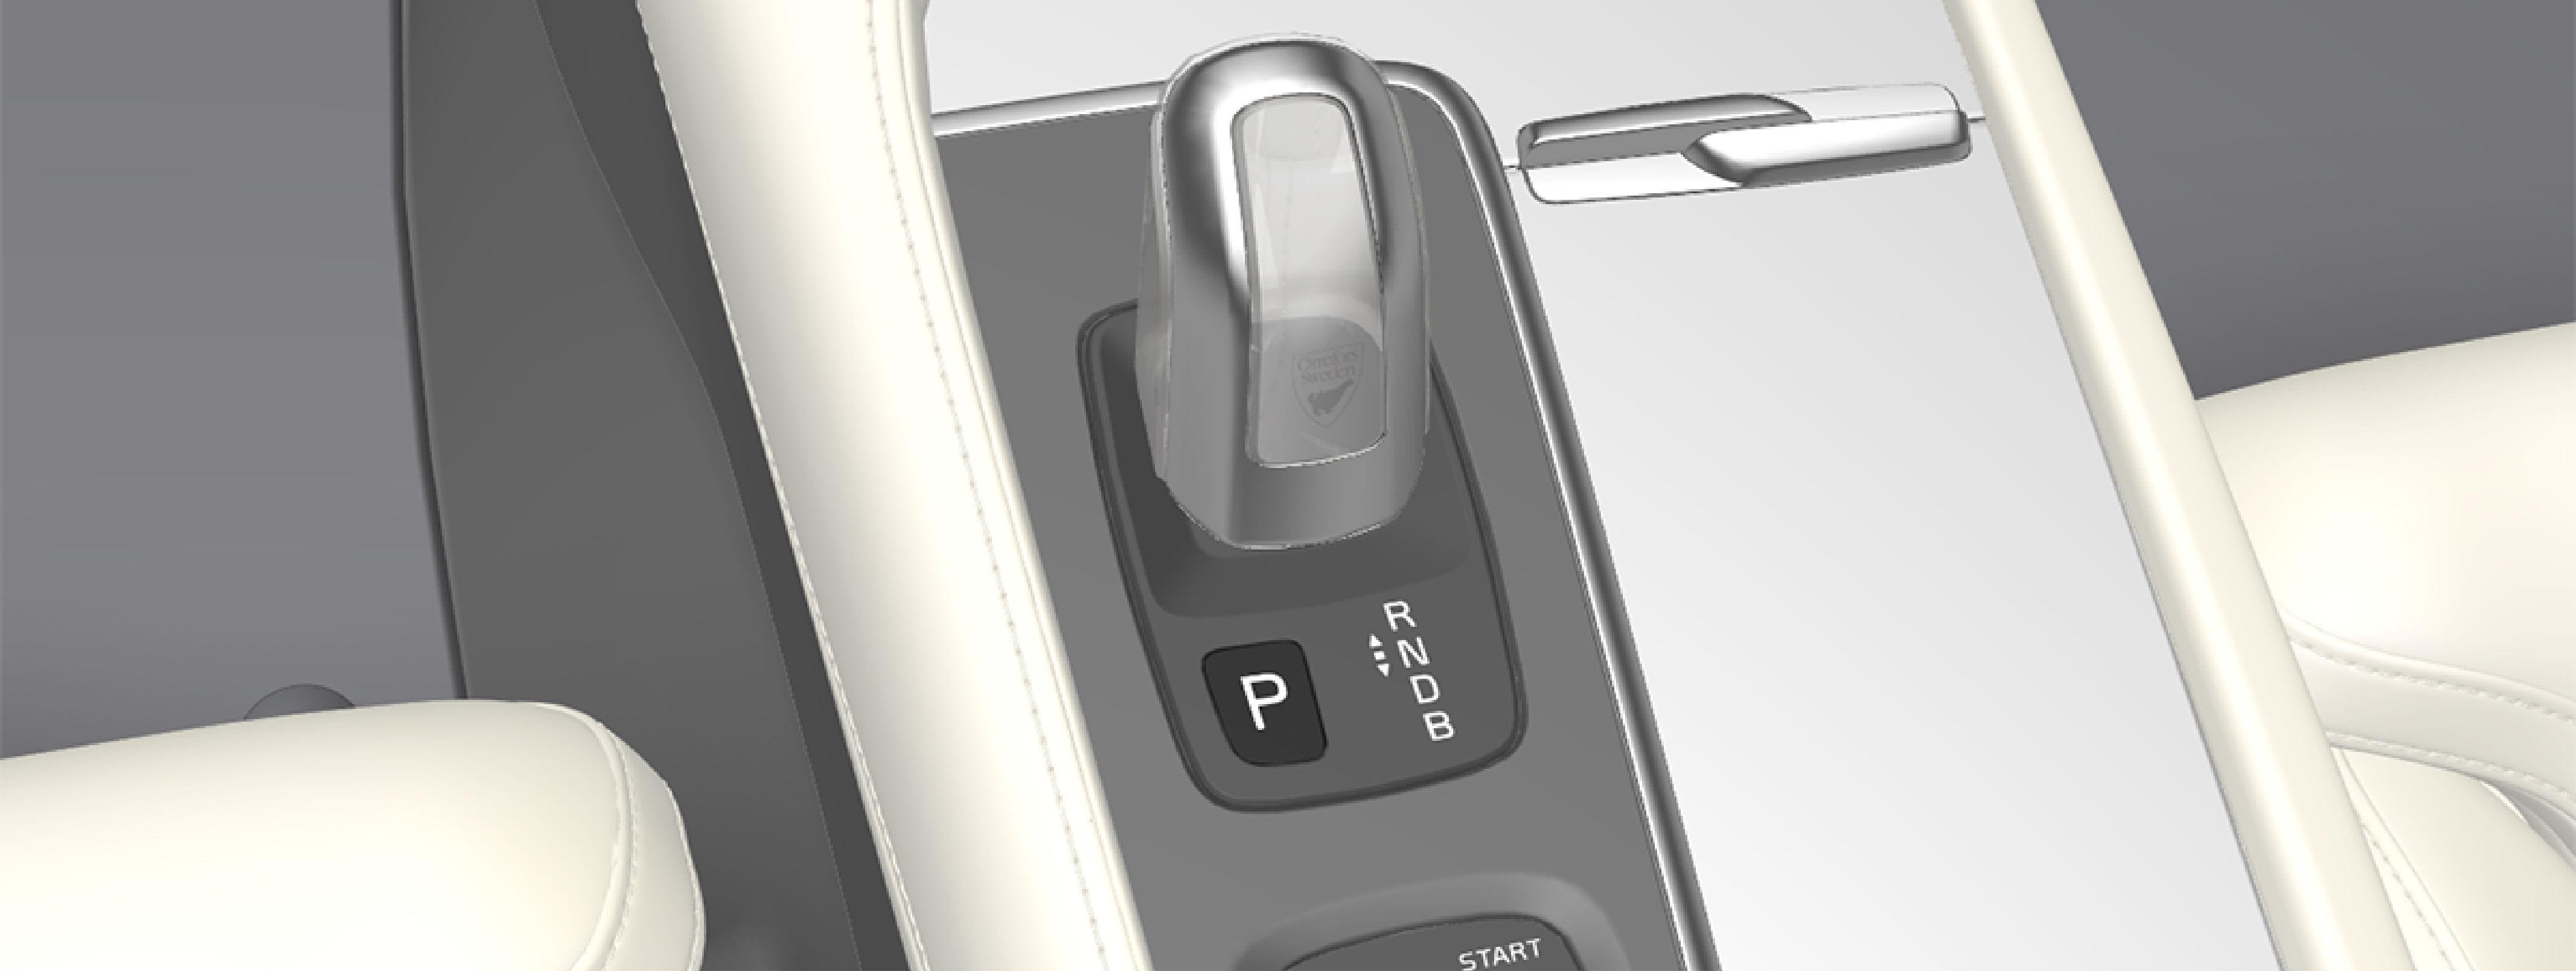 P5-1519-XC90 Hybrid -gear shift to P